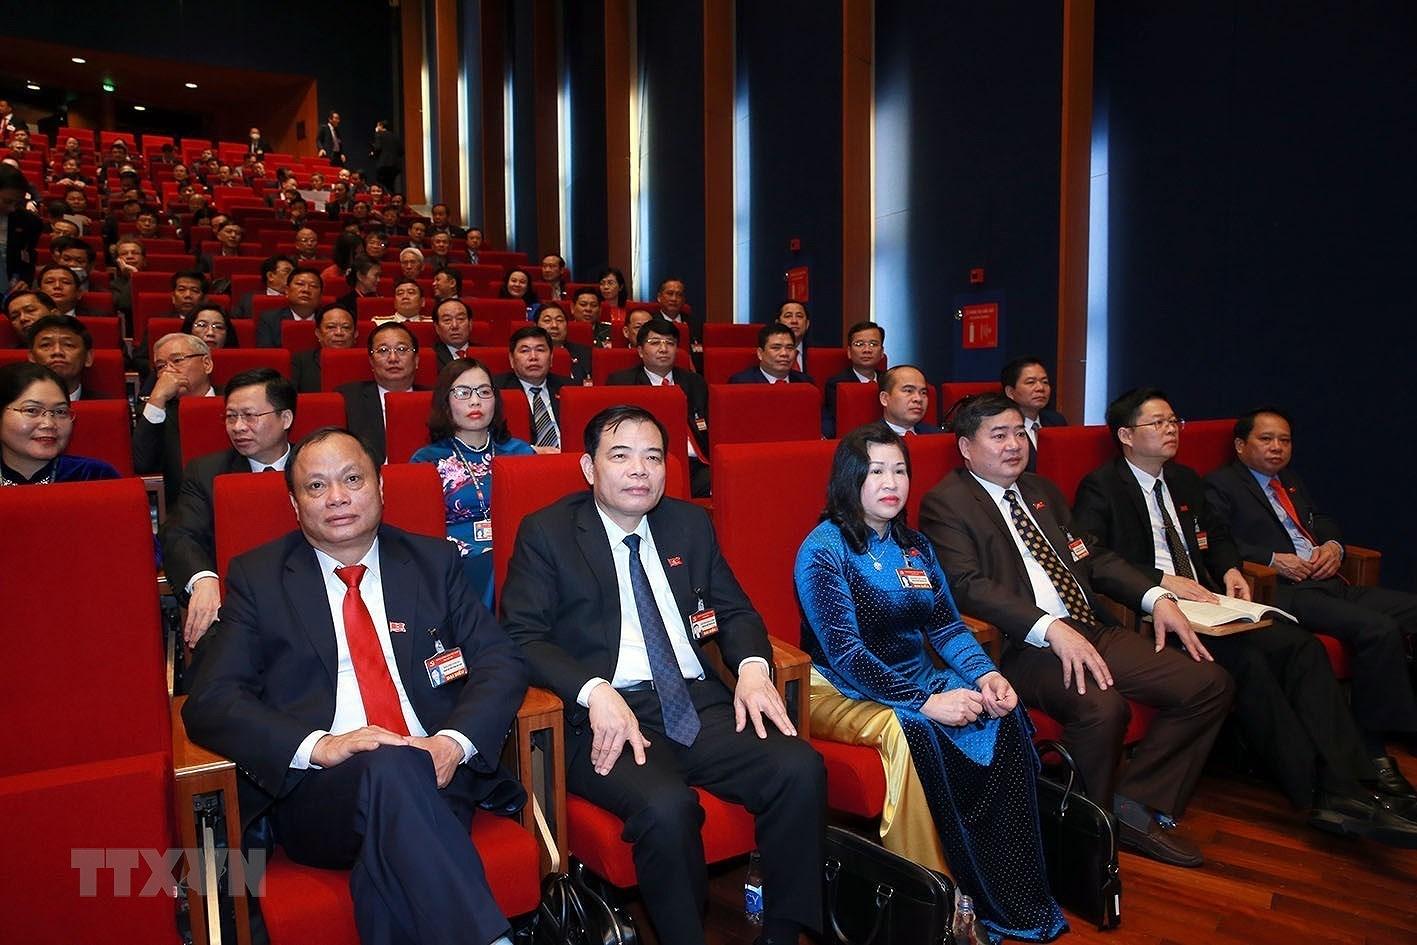 [Photo] Quang canh phien thao luan cac van kien Dai hoi XIII cua Dang hinh anh 23